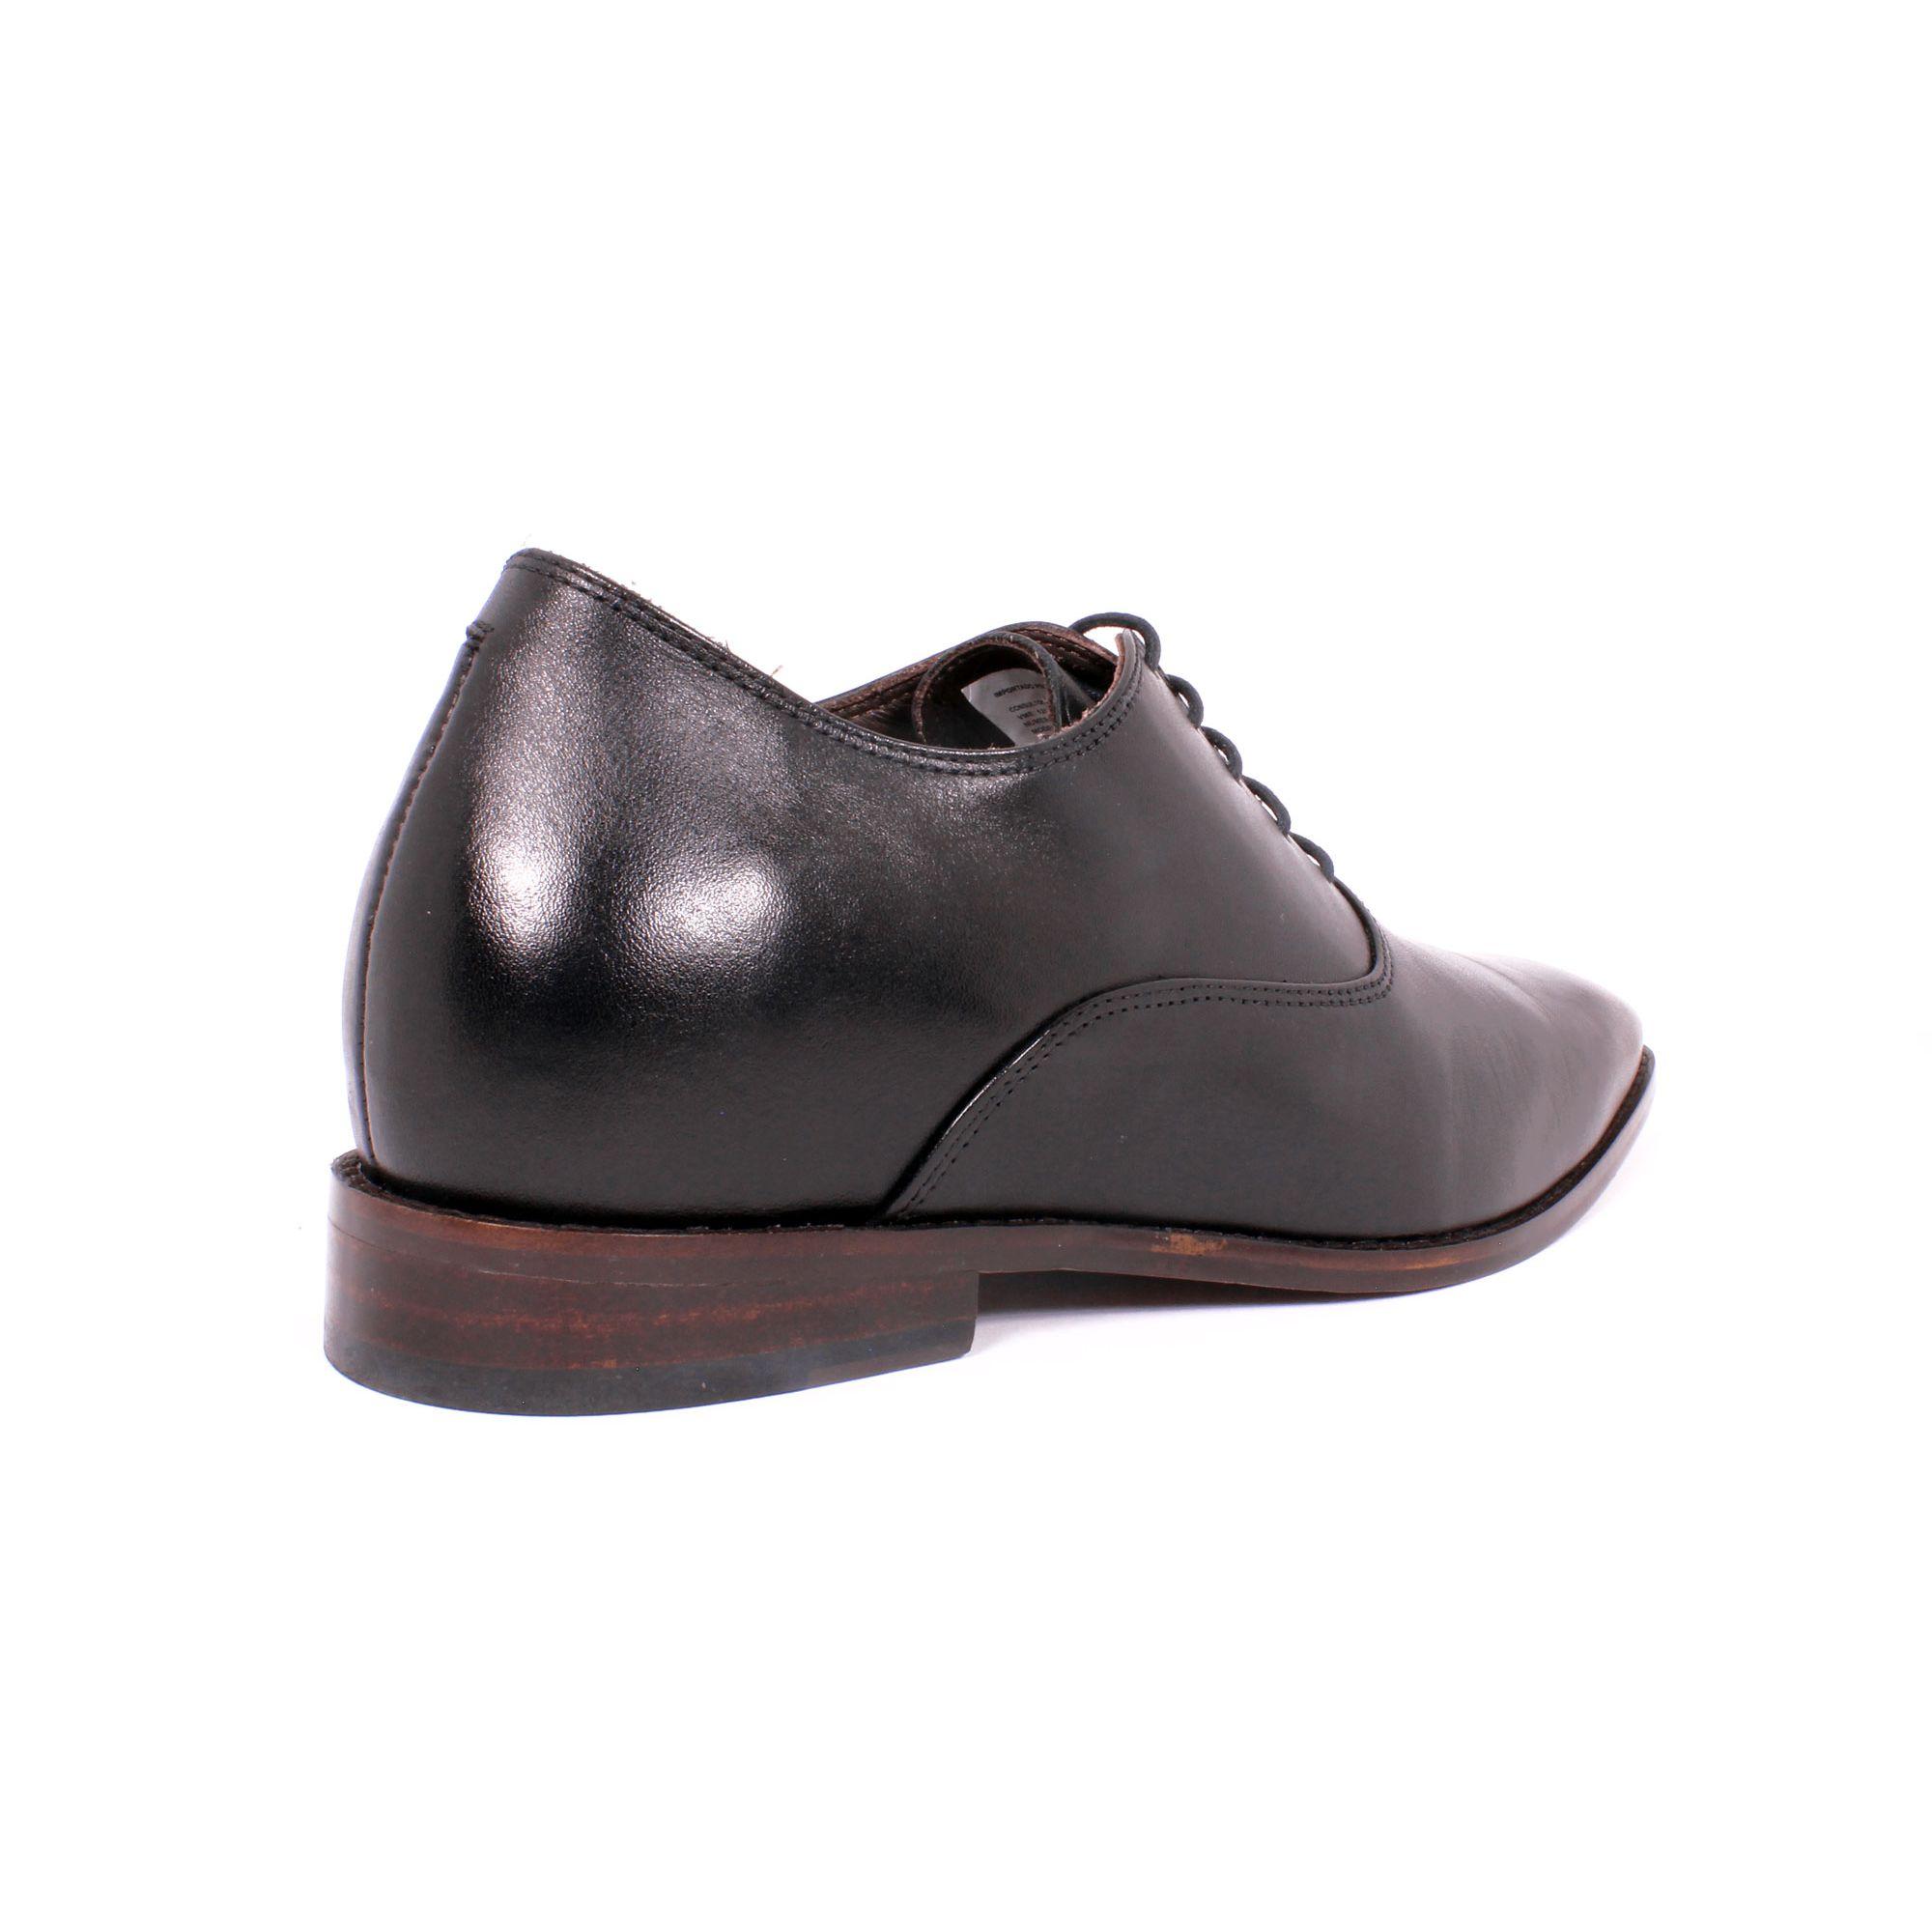 Zapato Formal Elegant Negro Max Denegri +7cm de Altura_70799